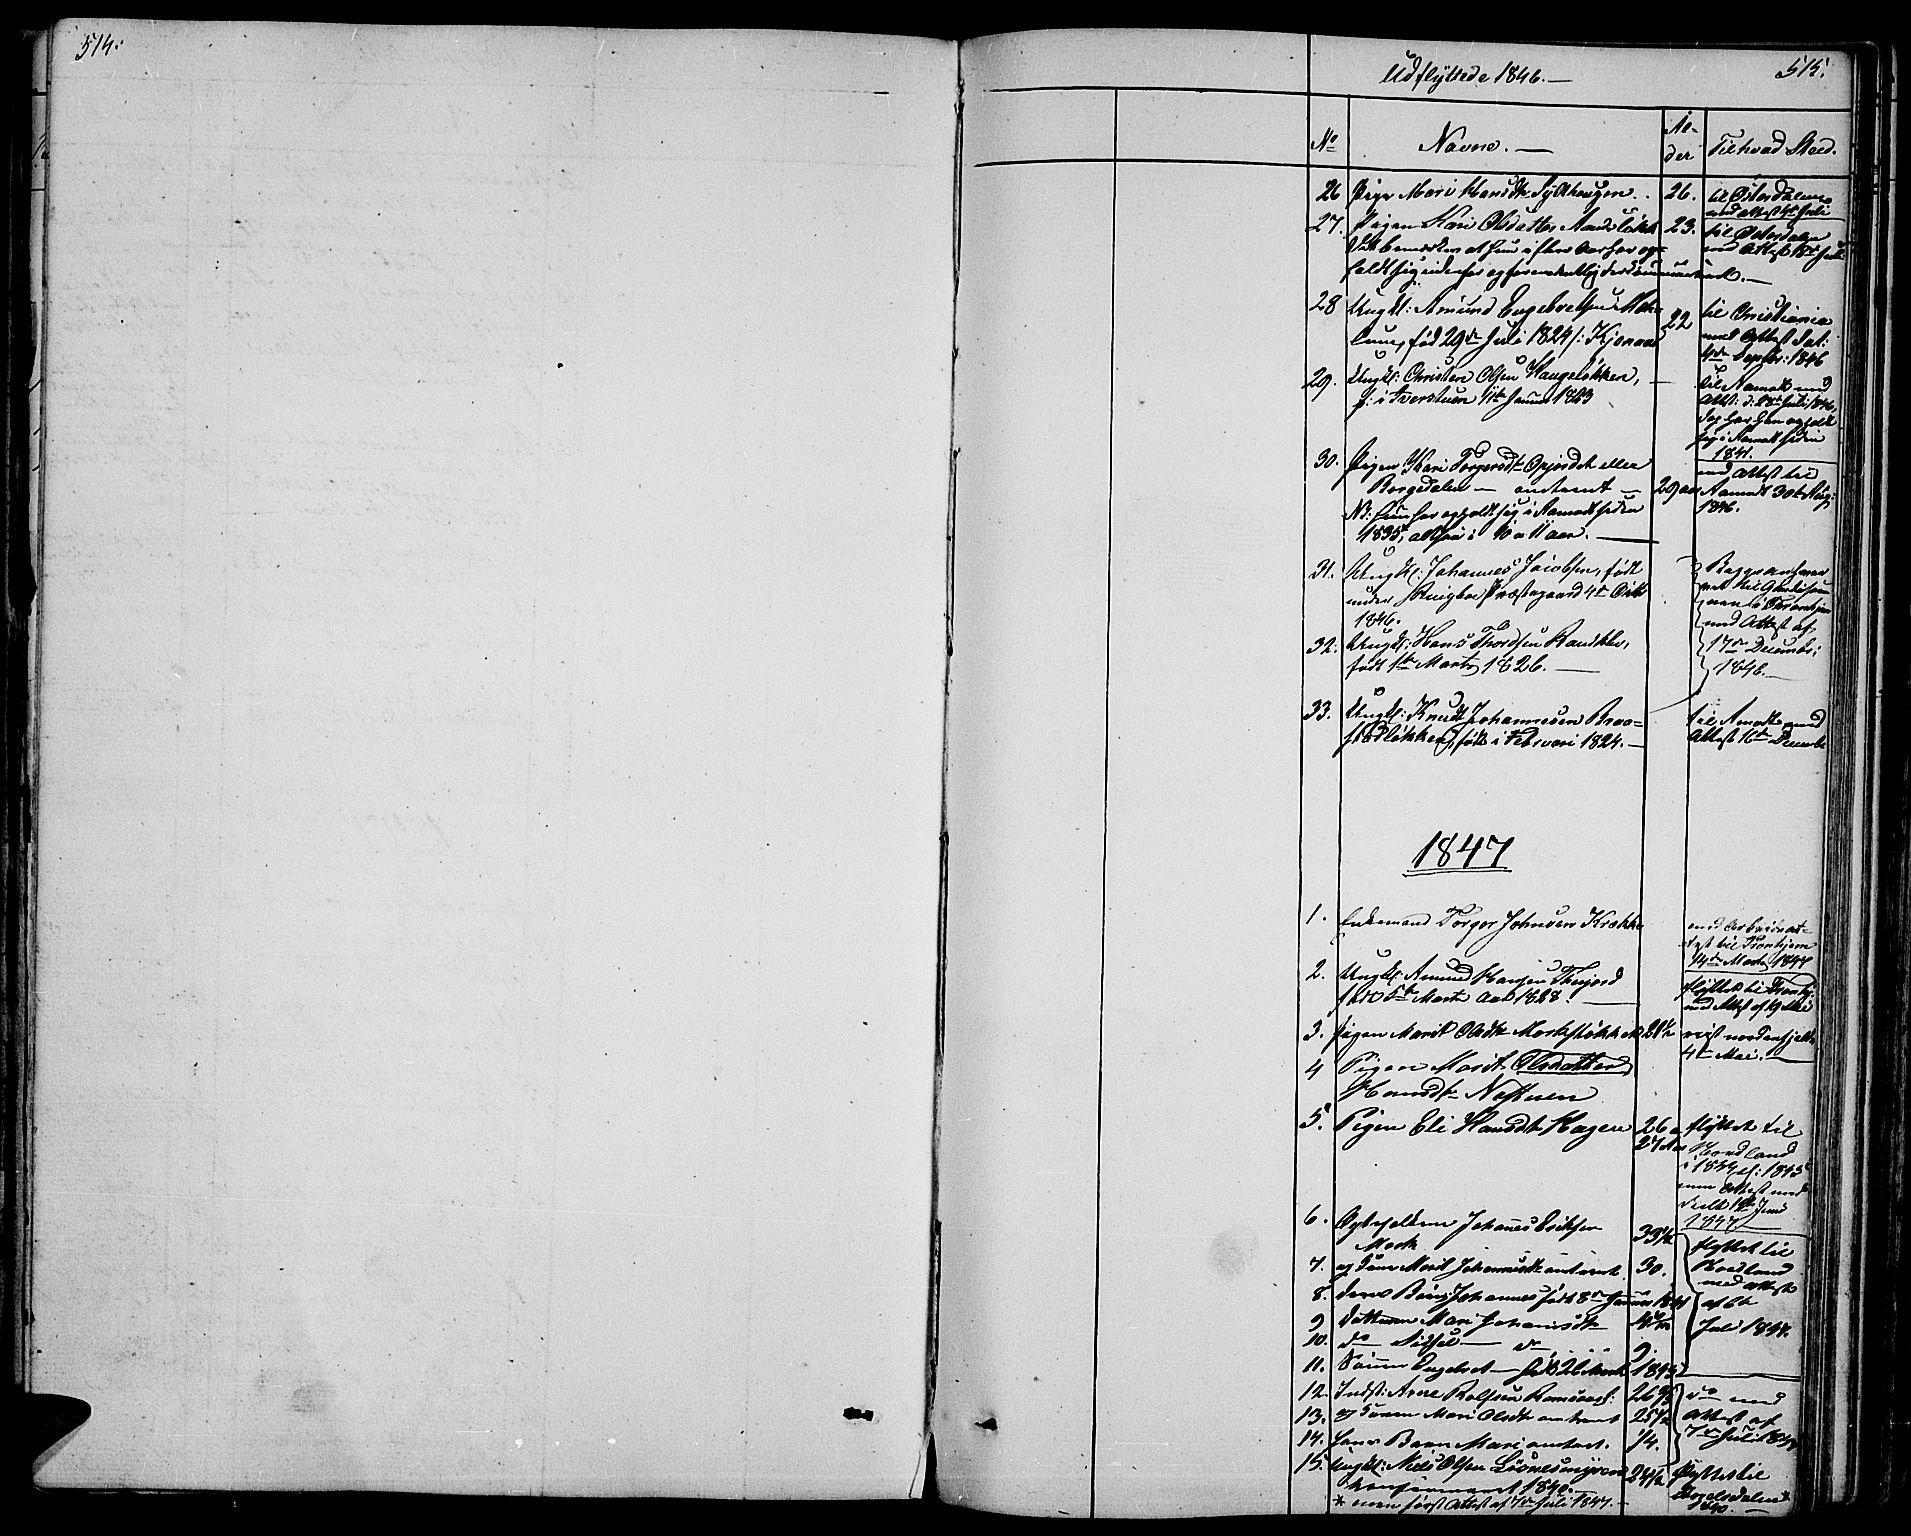 SAH, Ringebu prestekontor, Klokkerbok nr. 2, 1839-1853, s. 514-515